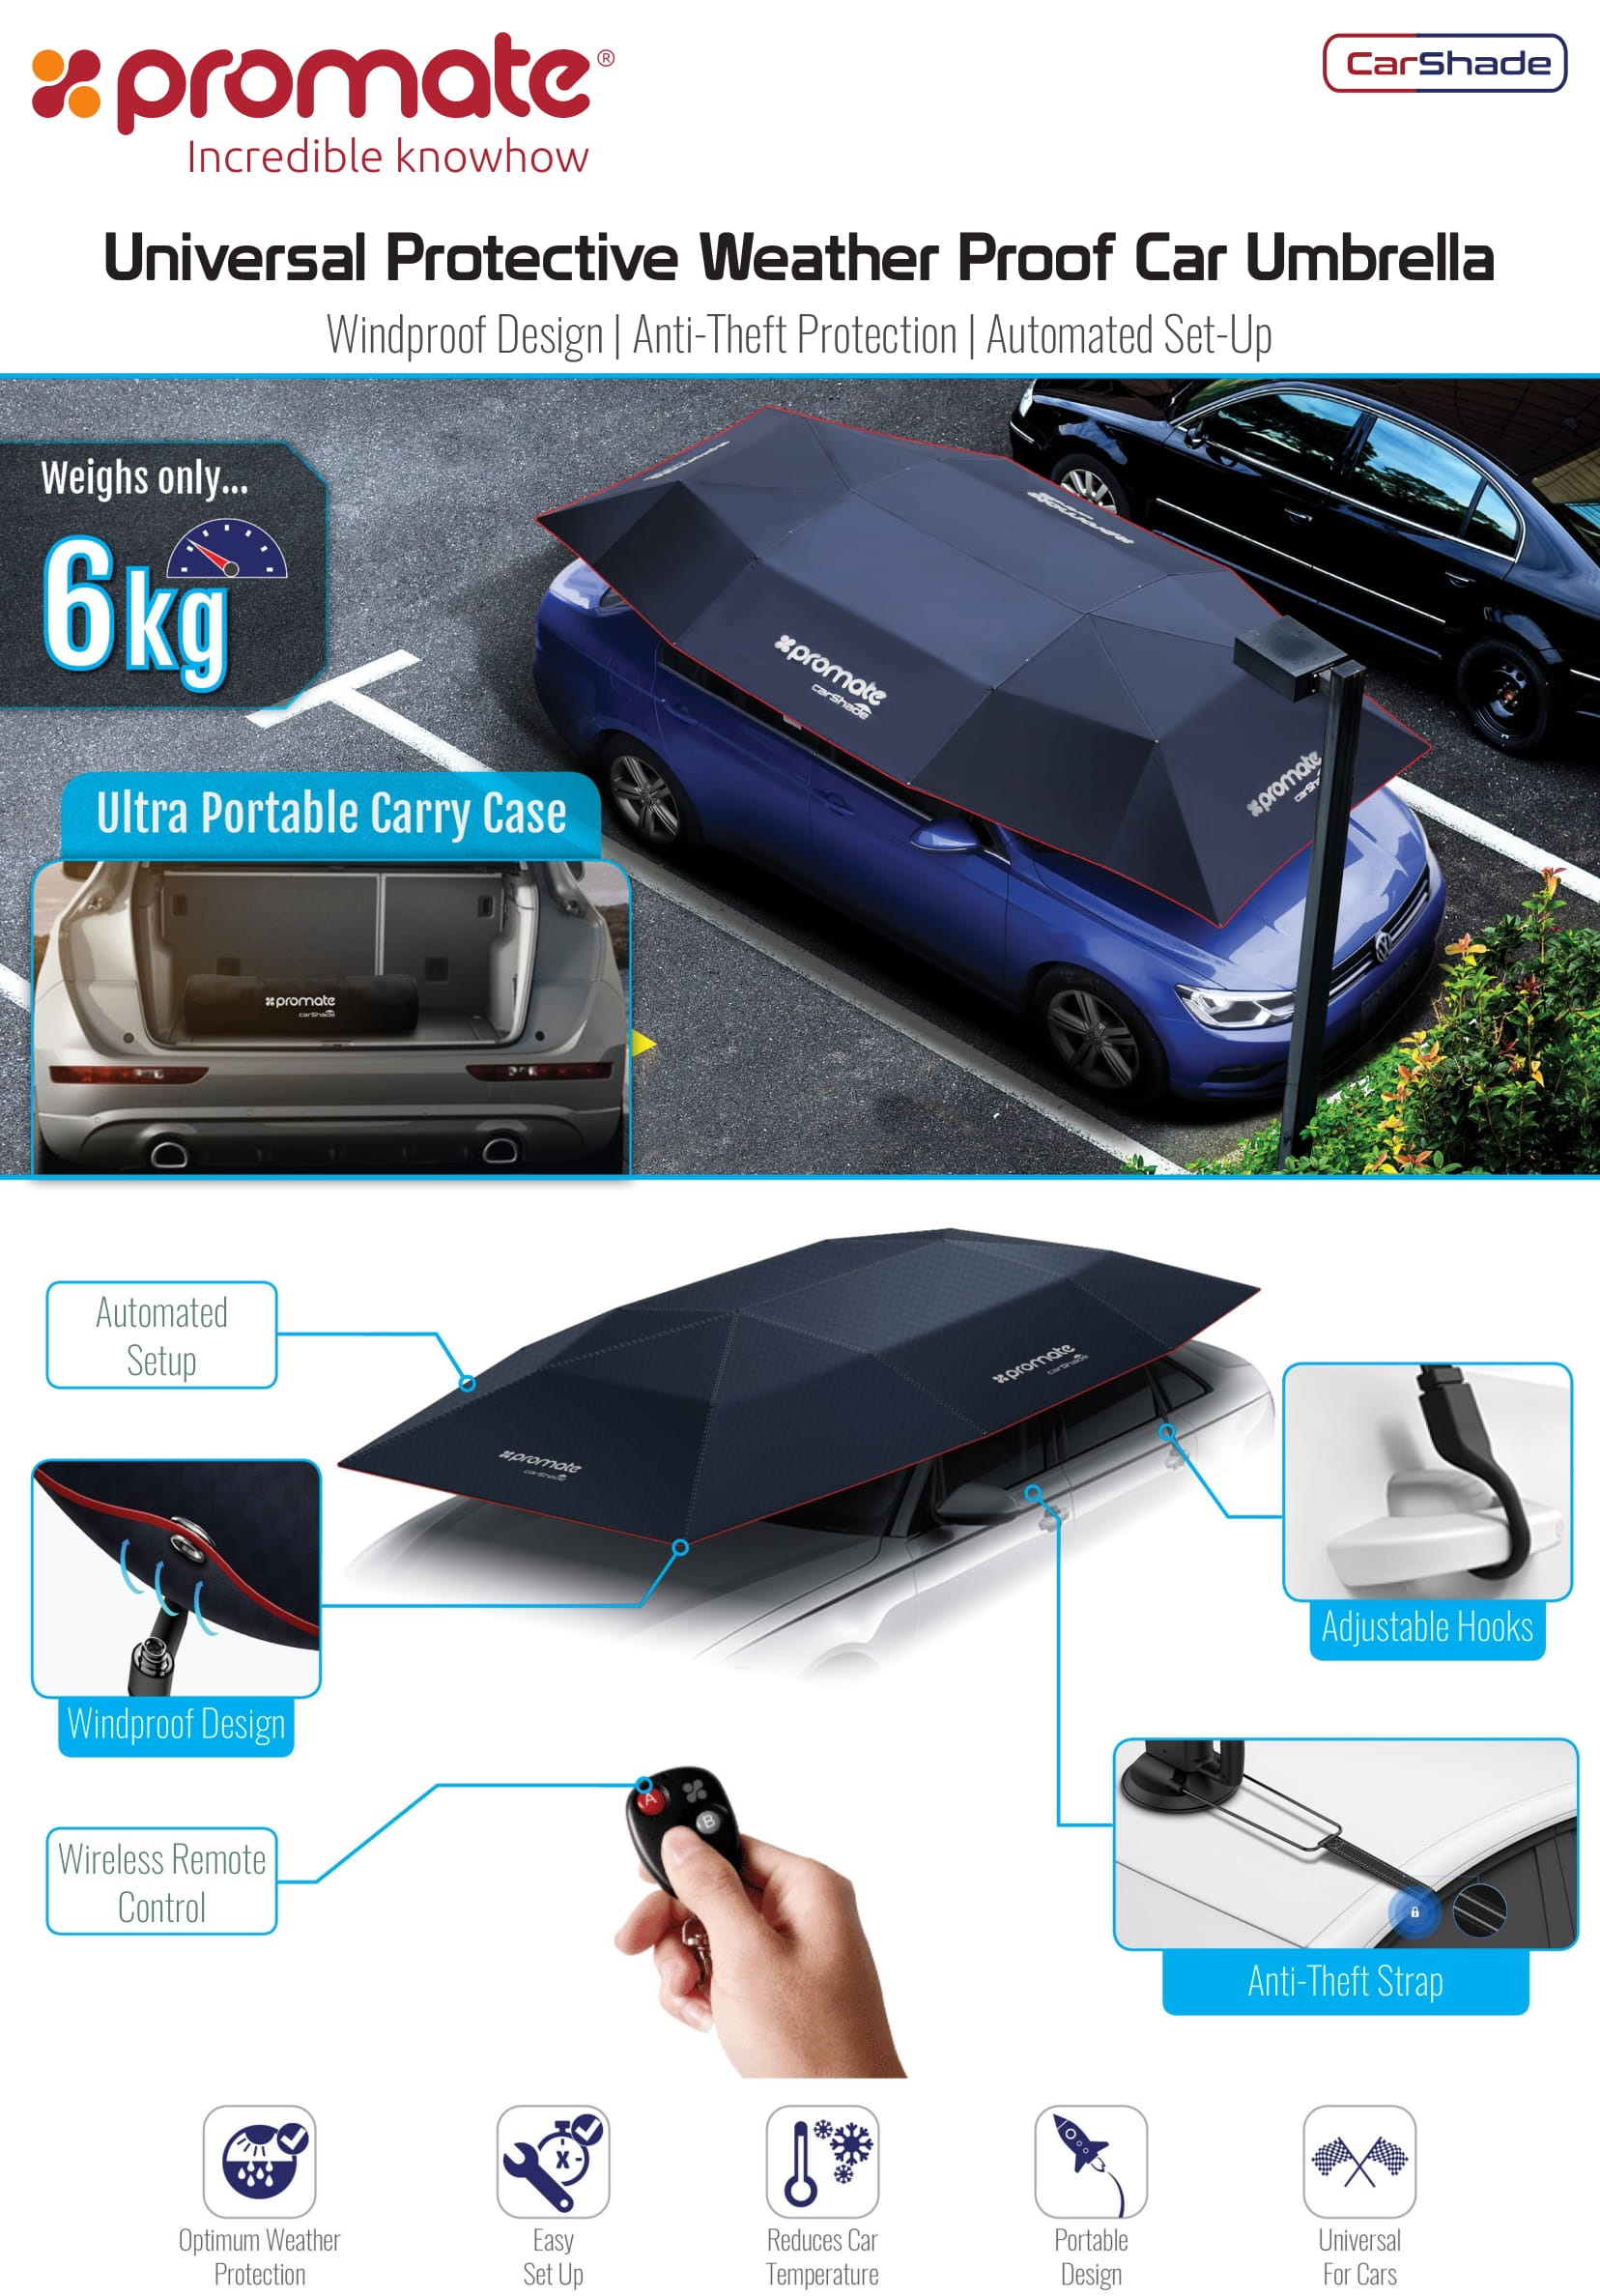 Promate CarShade